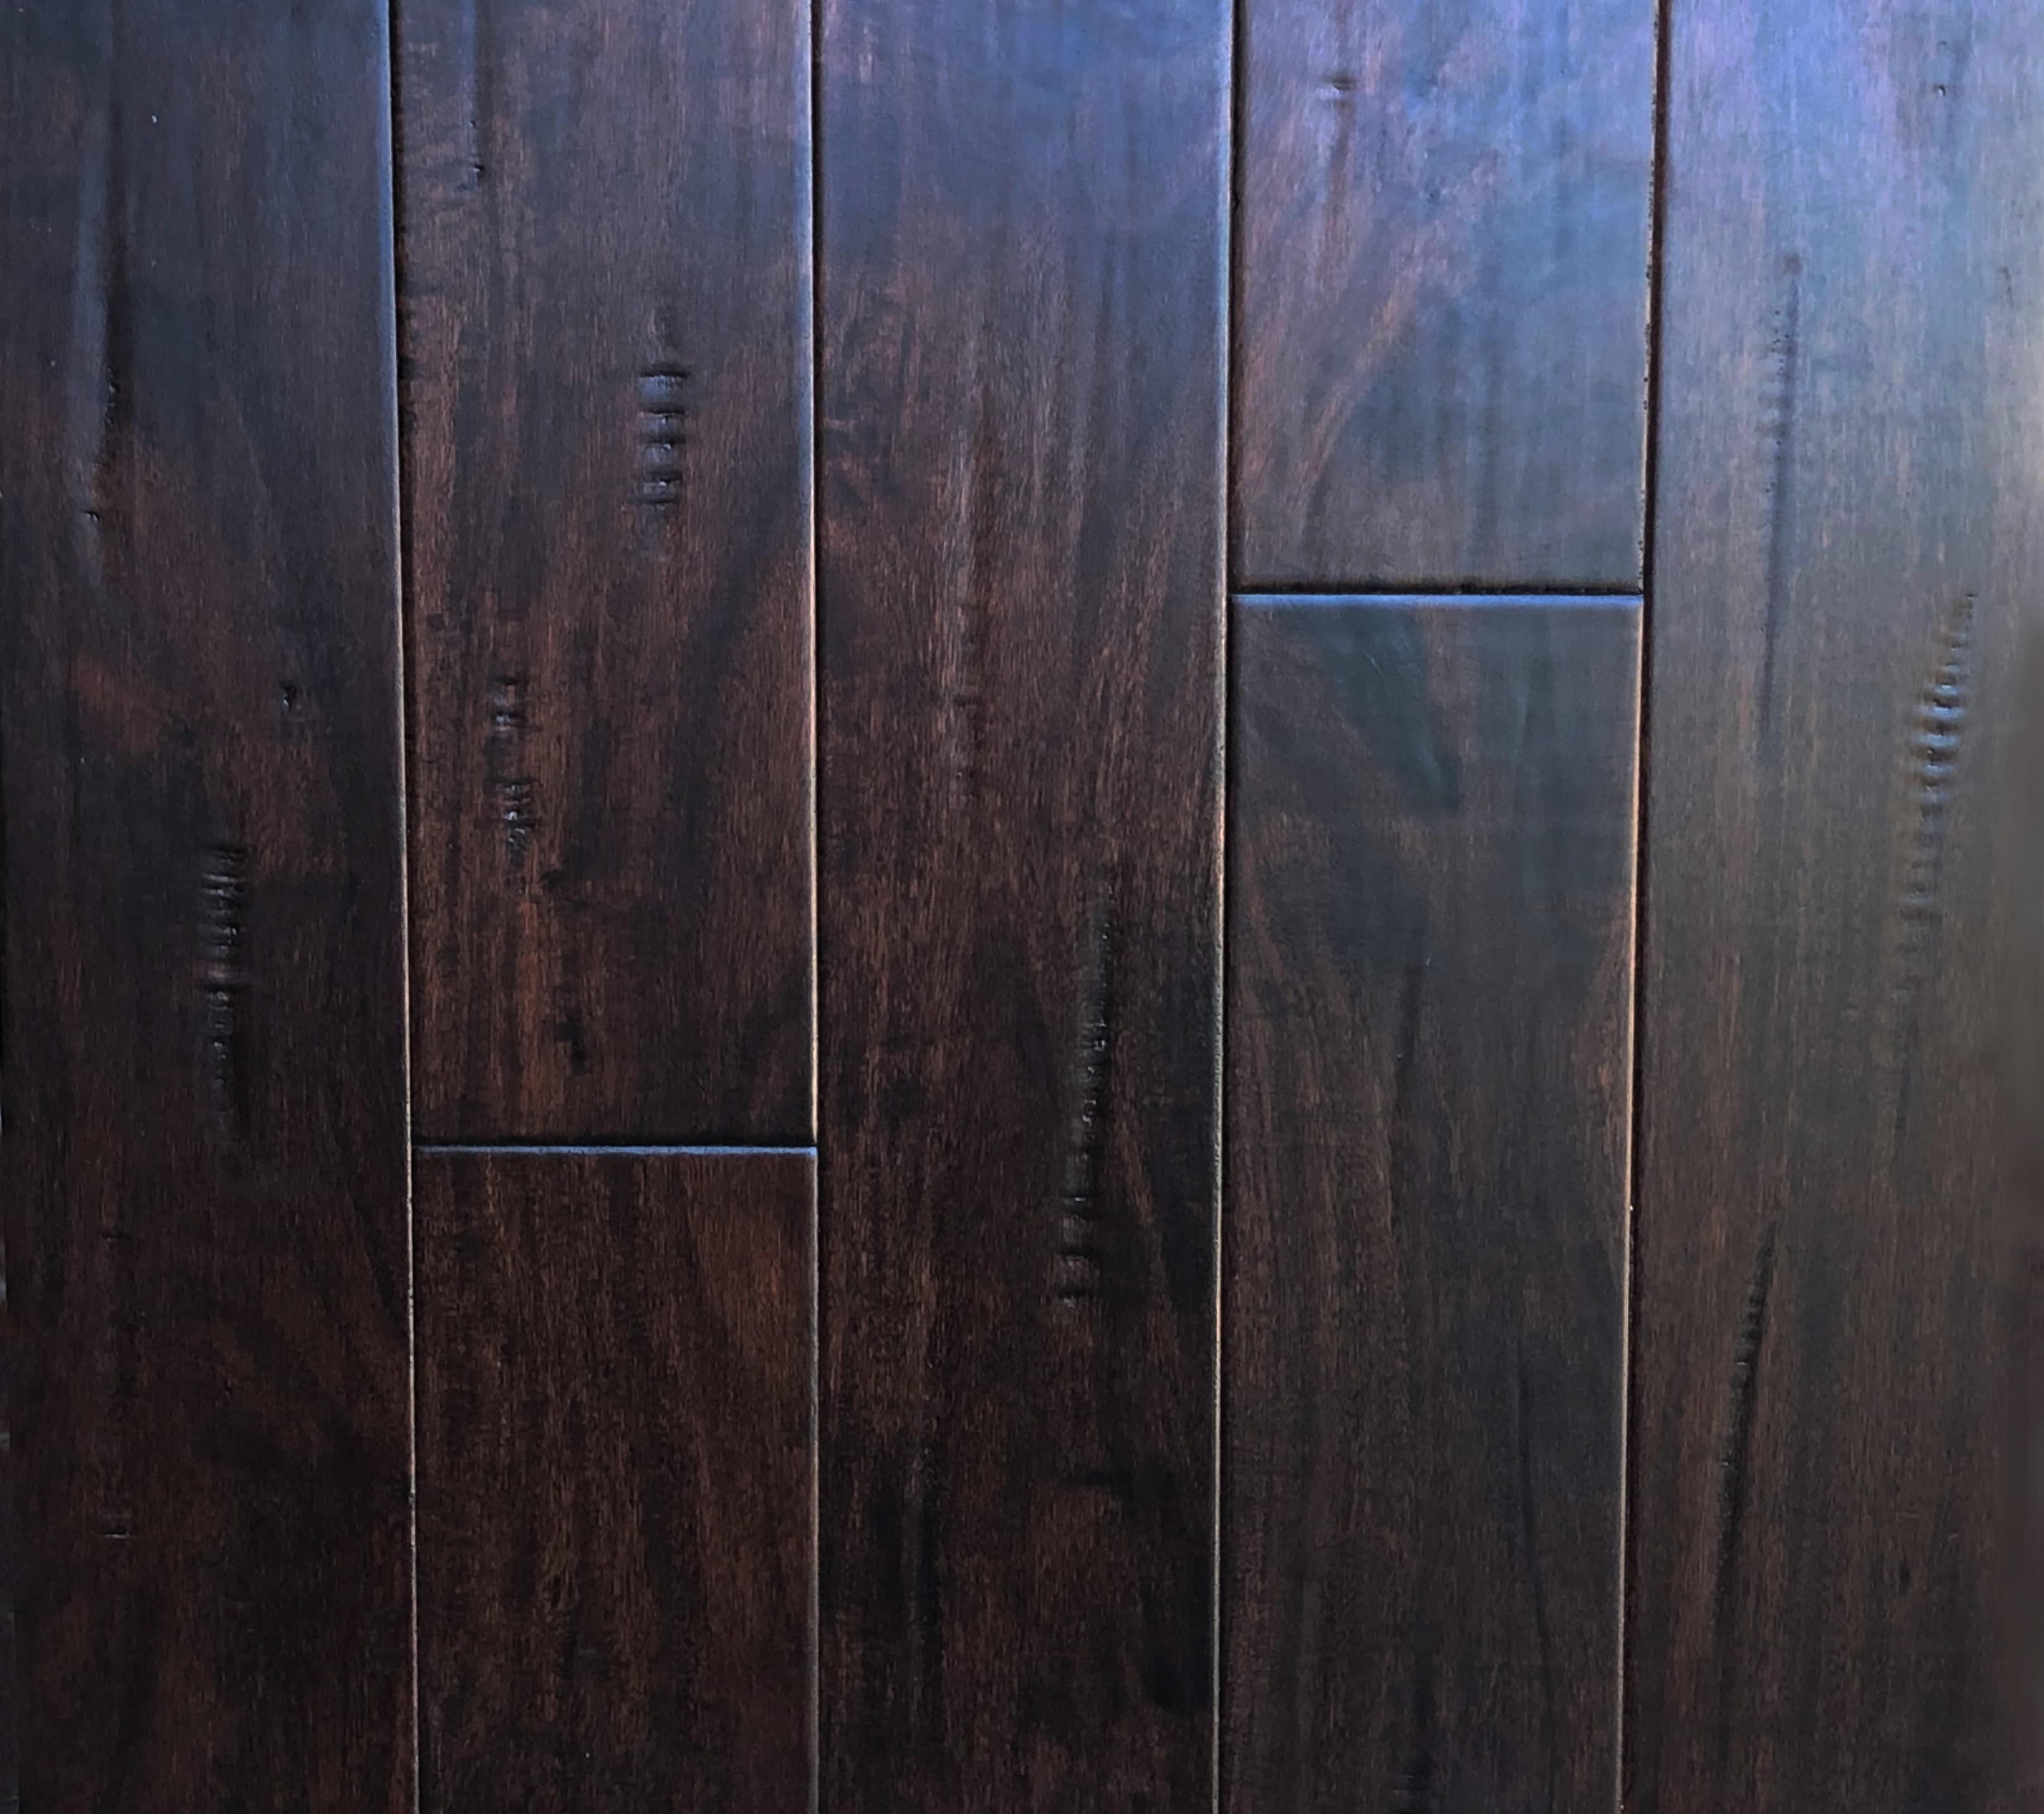 Cognac / Acacia / Treffert UV Cured Urethane Cross-linked fortified finish / RL x 4-3/4 x 9/16 Chelsea Collection, Acacia Engineered Hardwood Flooring 0